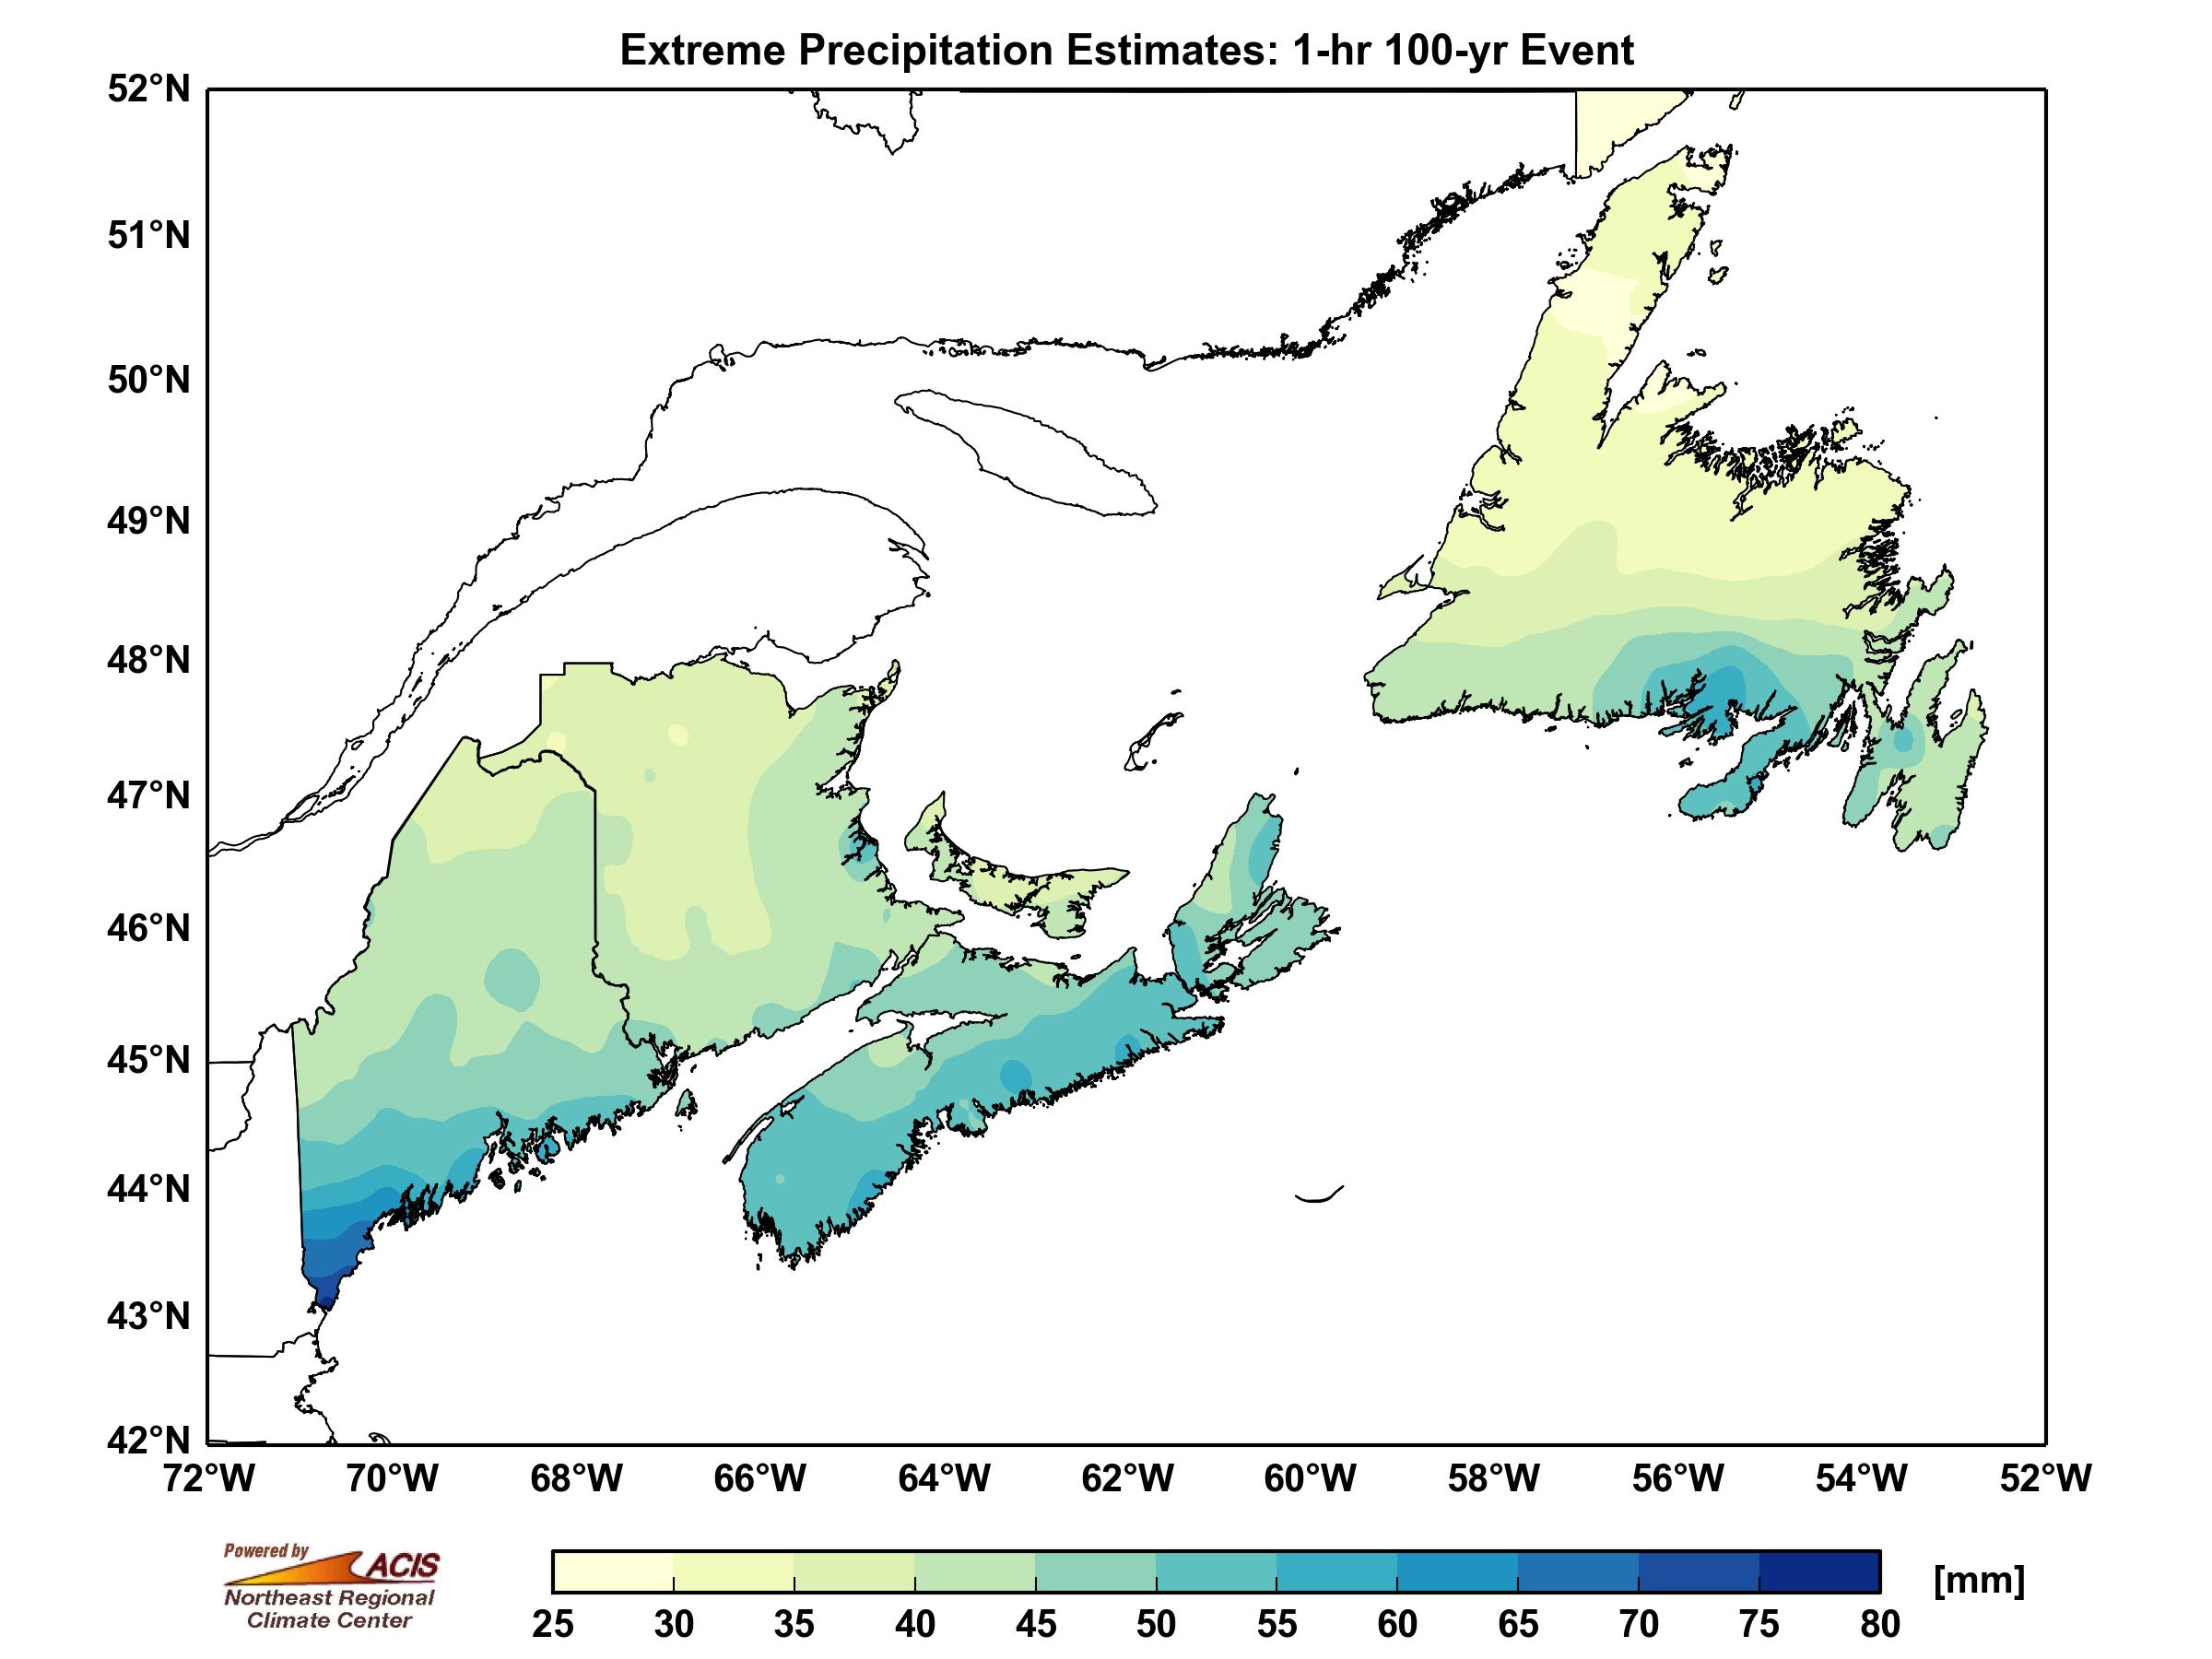 Atlantic Canada Extreme Precipitation